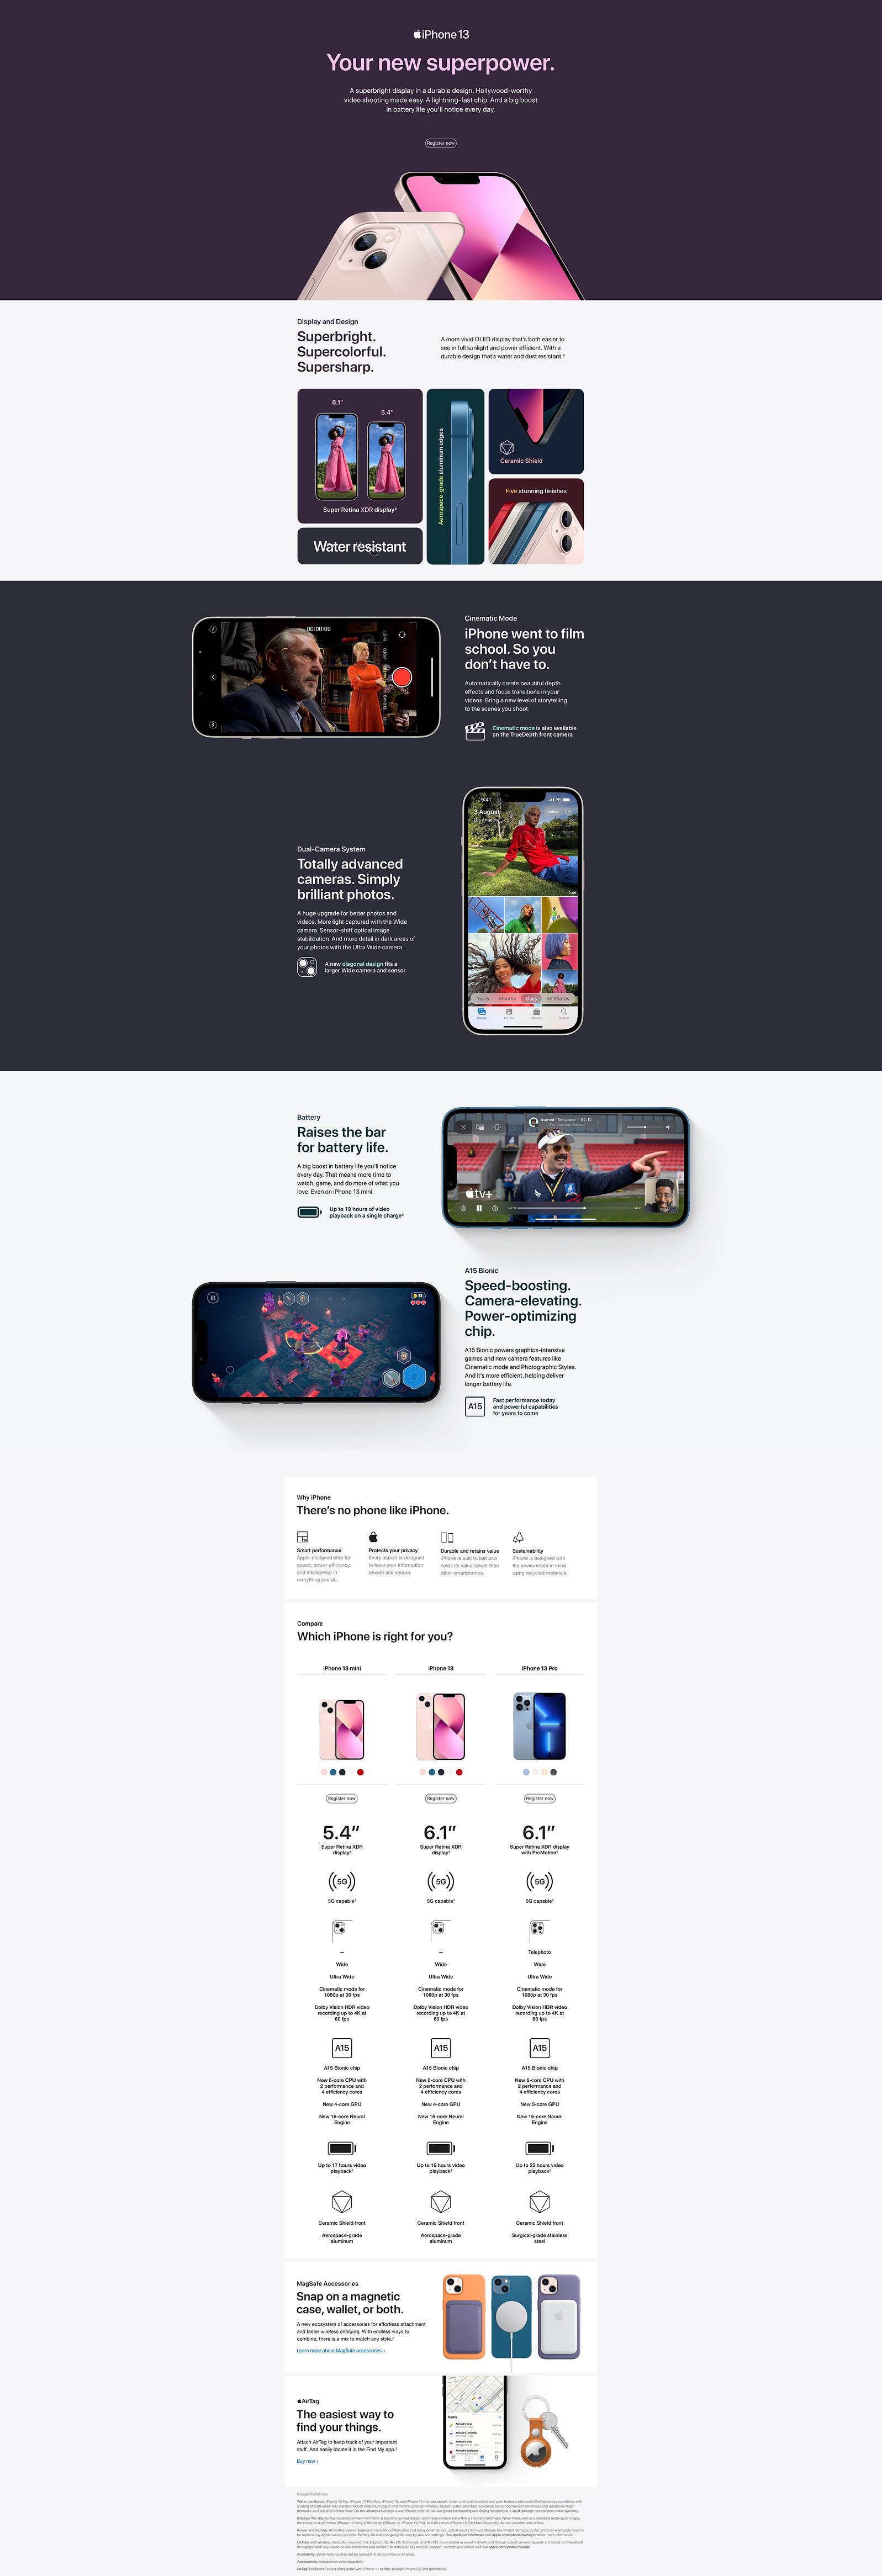 MEEN_iPhone13_no5G_Q421_Web_Marketing_Pages_L.jpg